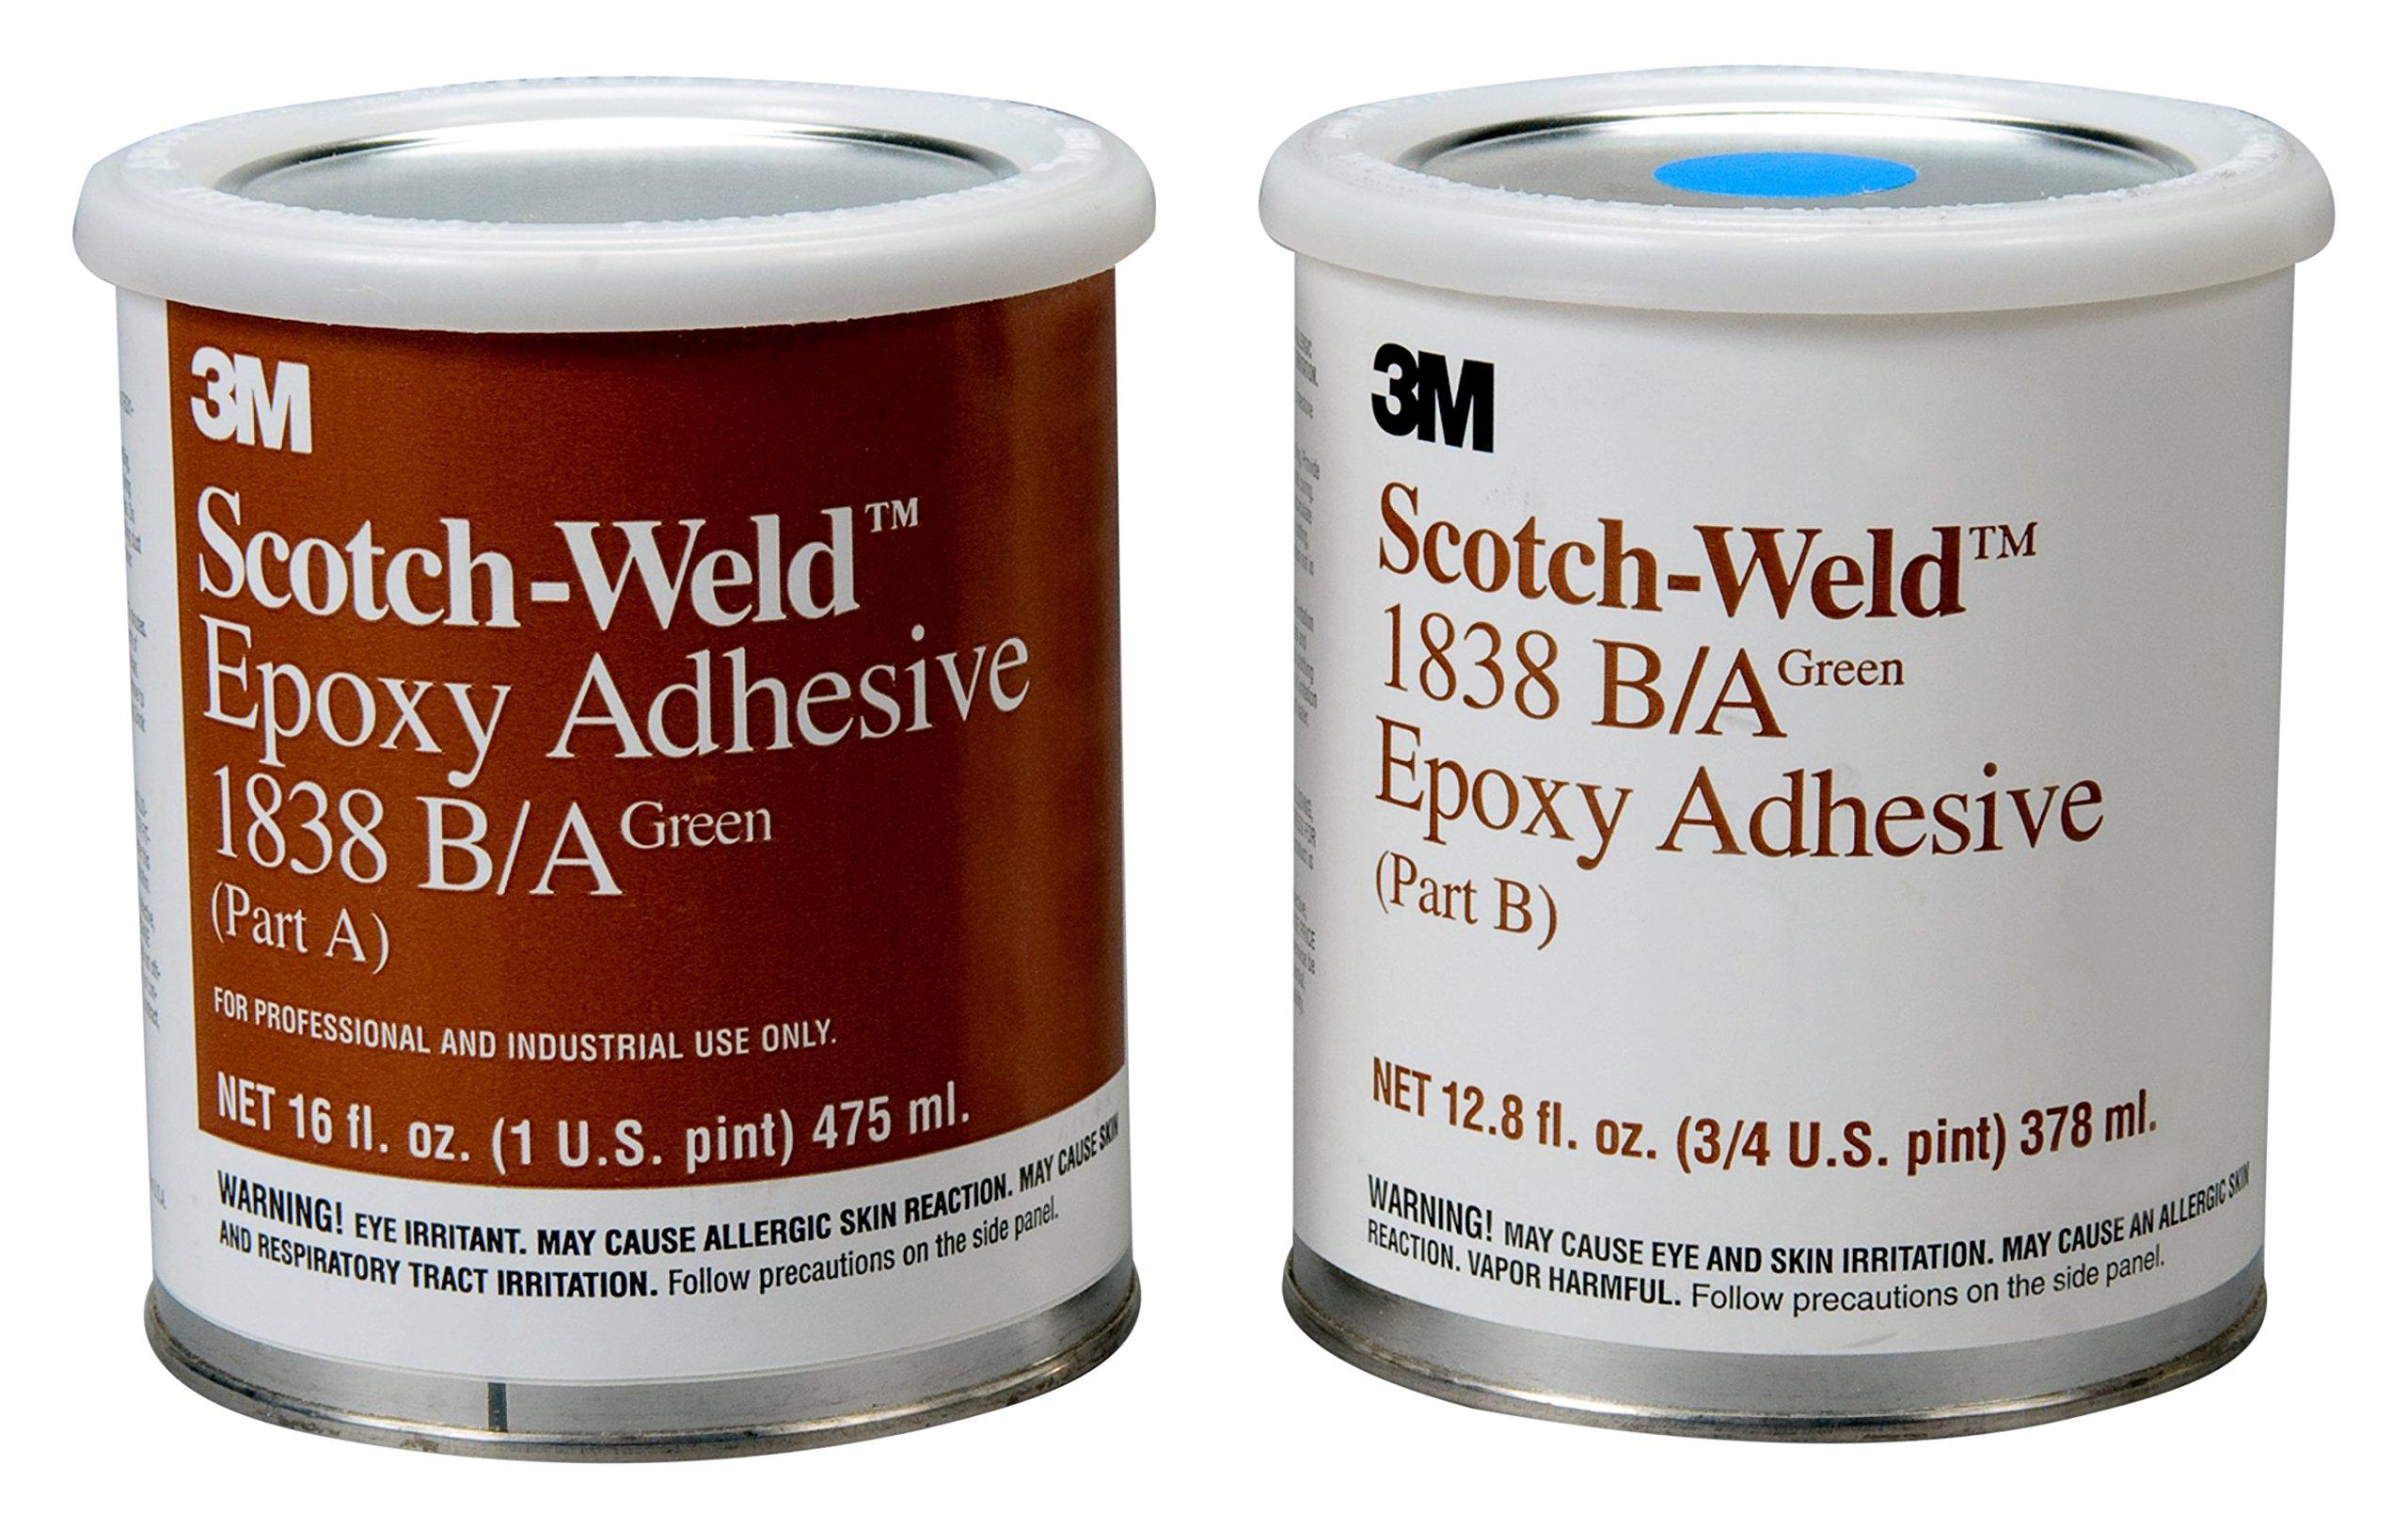 3M Scotch-Weld 20152 Epoxy Adhesive 1838 Part B/A, Green, 1 quart Kit